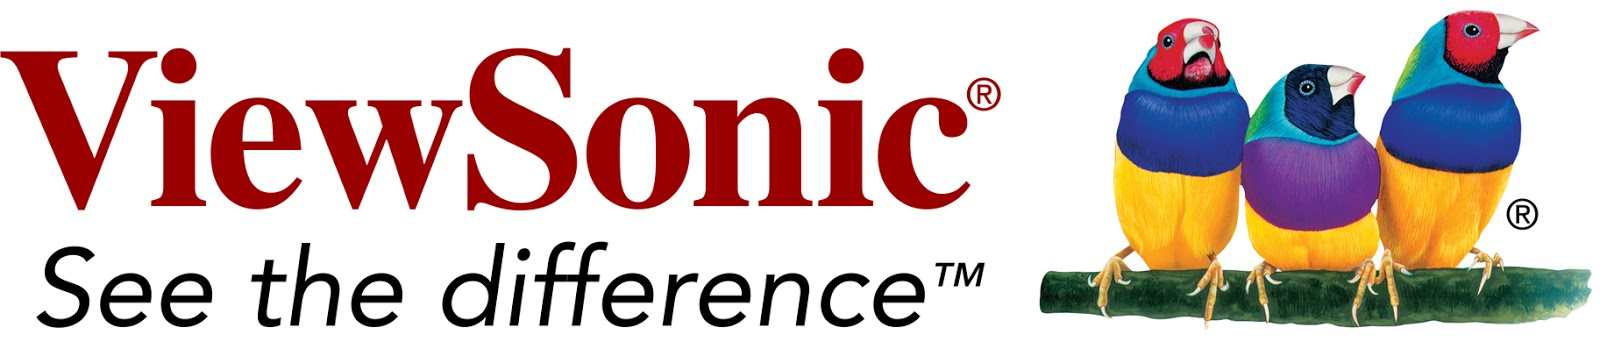 ViewSonic - Wikipedia